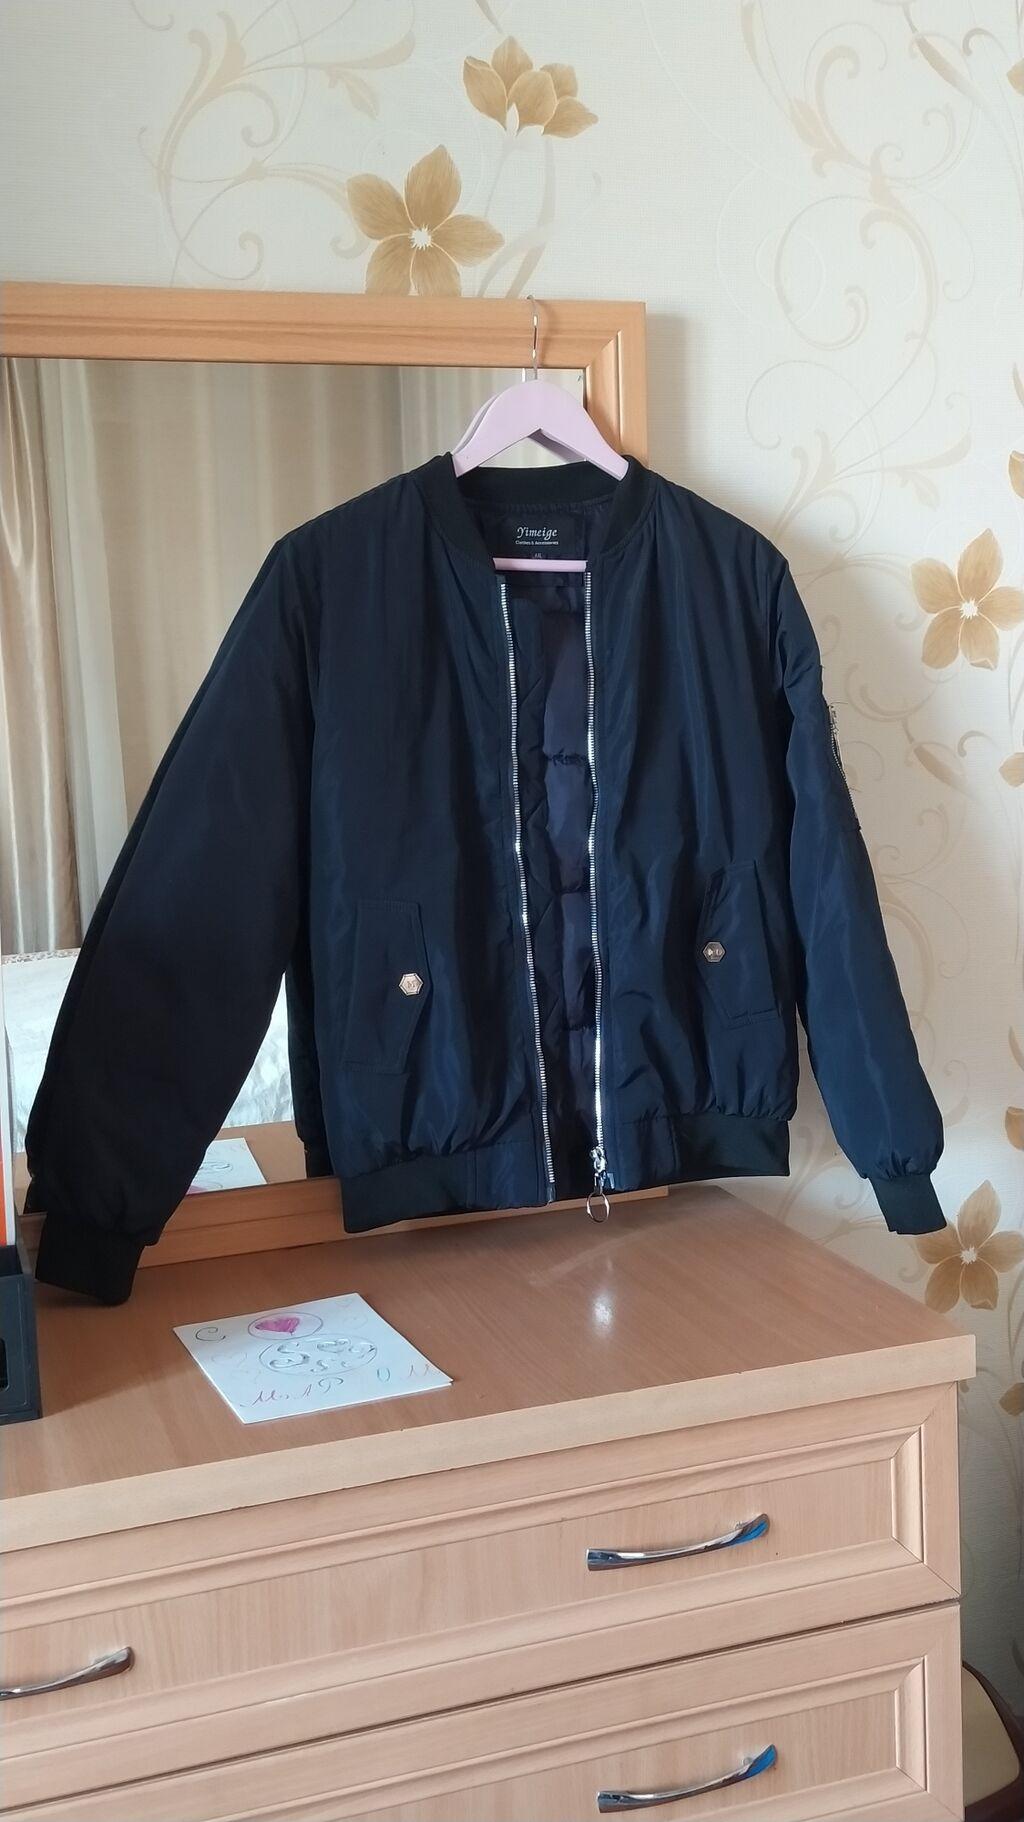 Куртка бомбер yimeige размер xxl 175/96A б/у: Куртка бомбер yimeige размер xxl 175/96A б/у